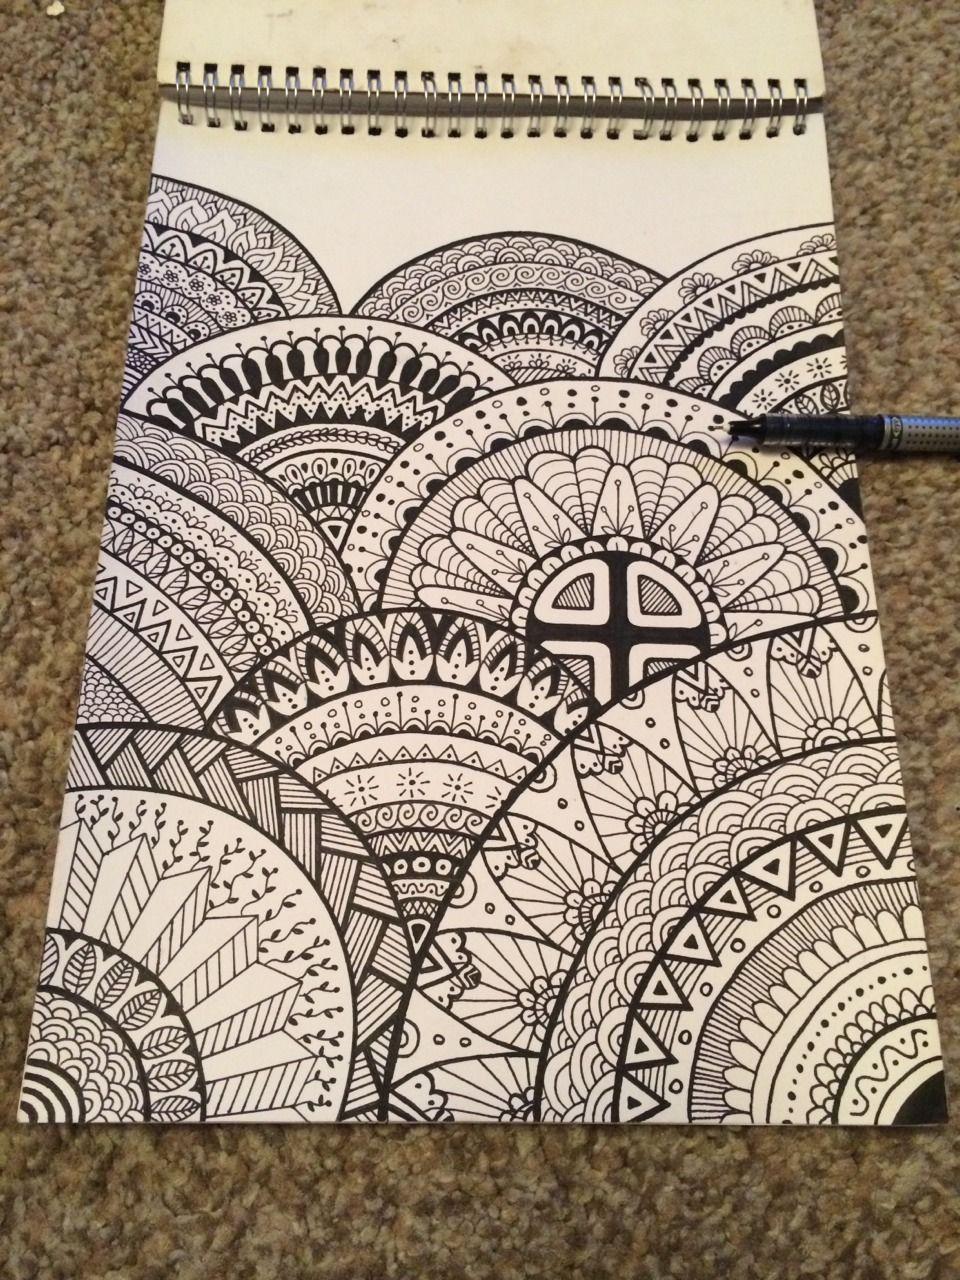 Home Design Architekturzeichnung Drawing On Demand Mandala Kunstunterricht Mandala Kunst Muster Malerei